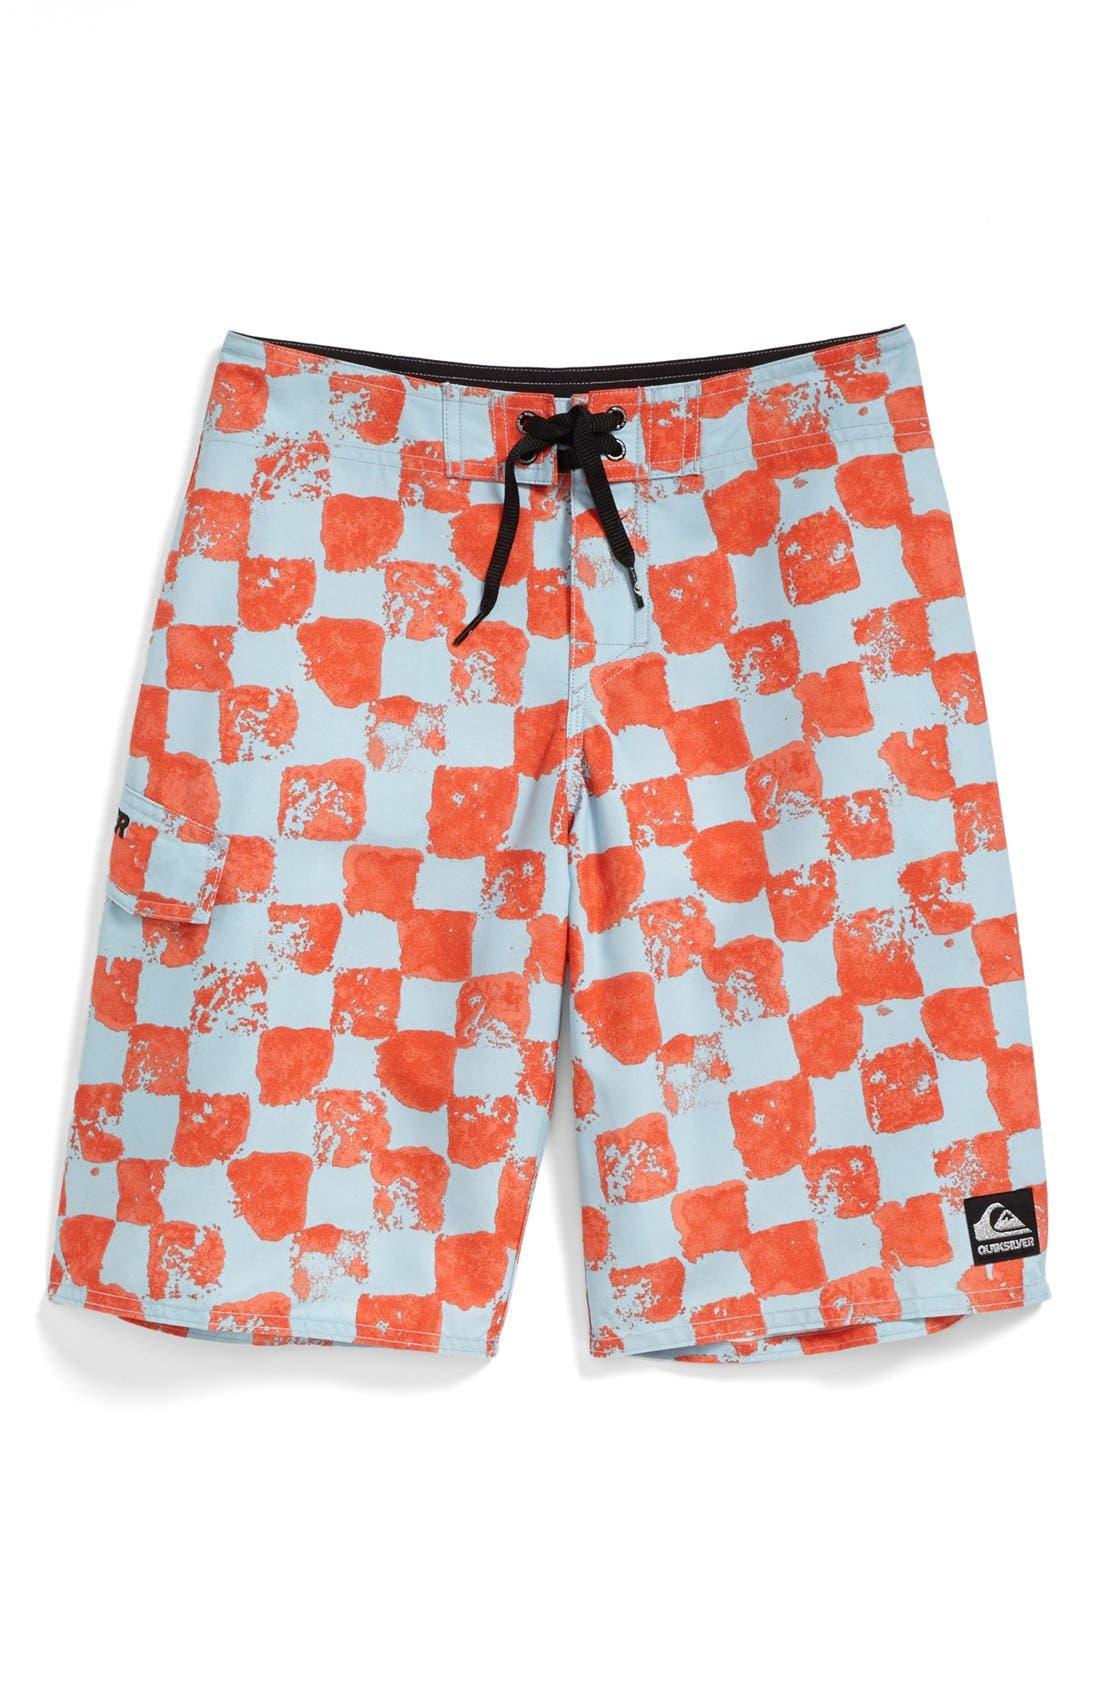 Alternate Image 1 Selected - Quiksilver 'Magic Palm' Board Shorts (Big Boys)